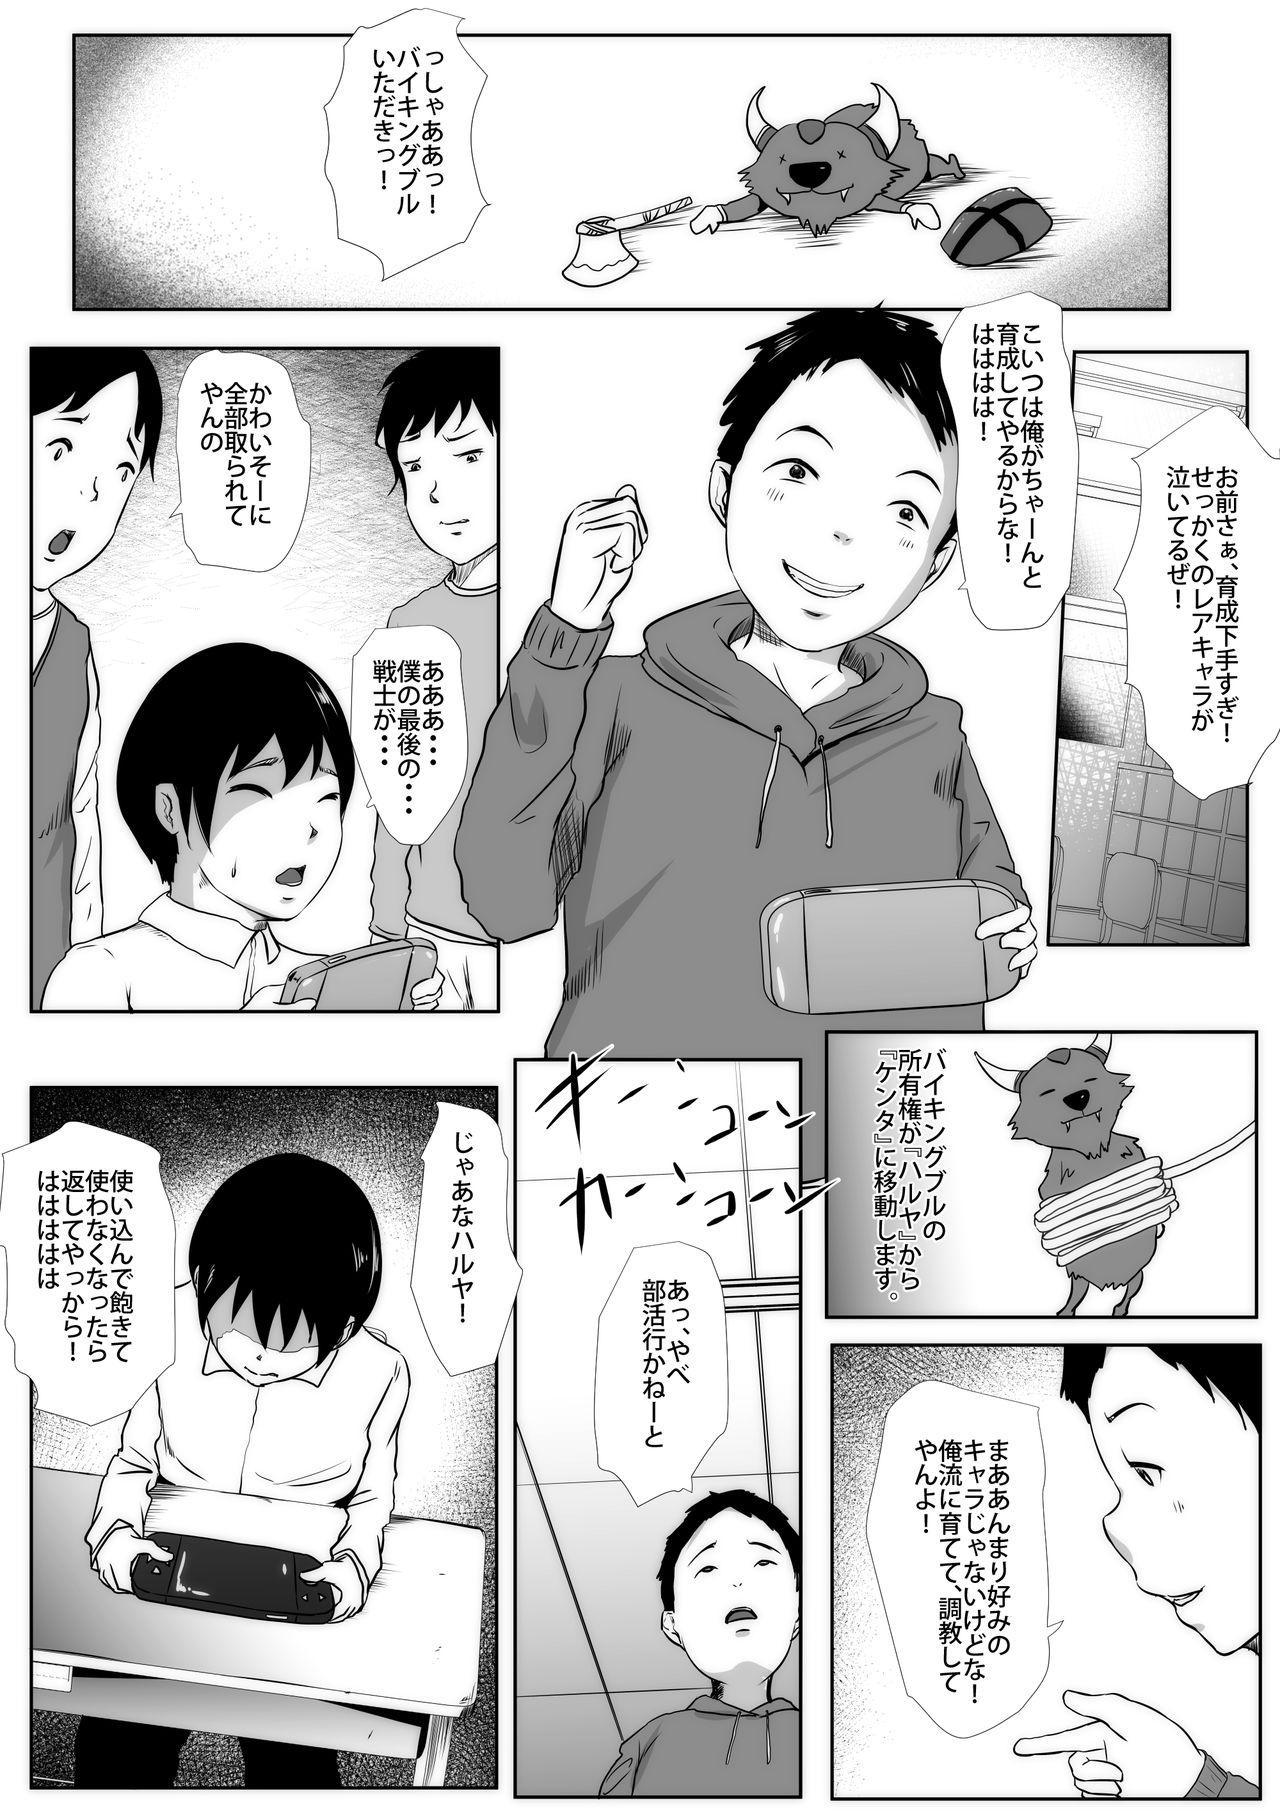 Hahaoya Trading, Friend Kyouyuu Ikusei NTR 2